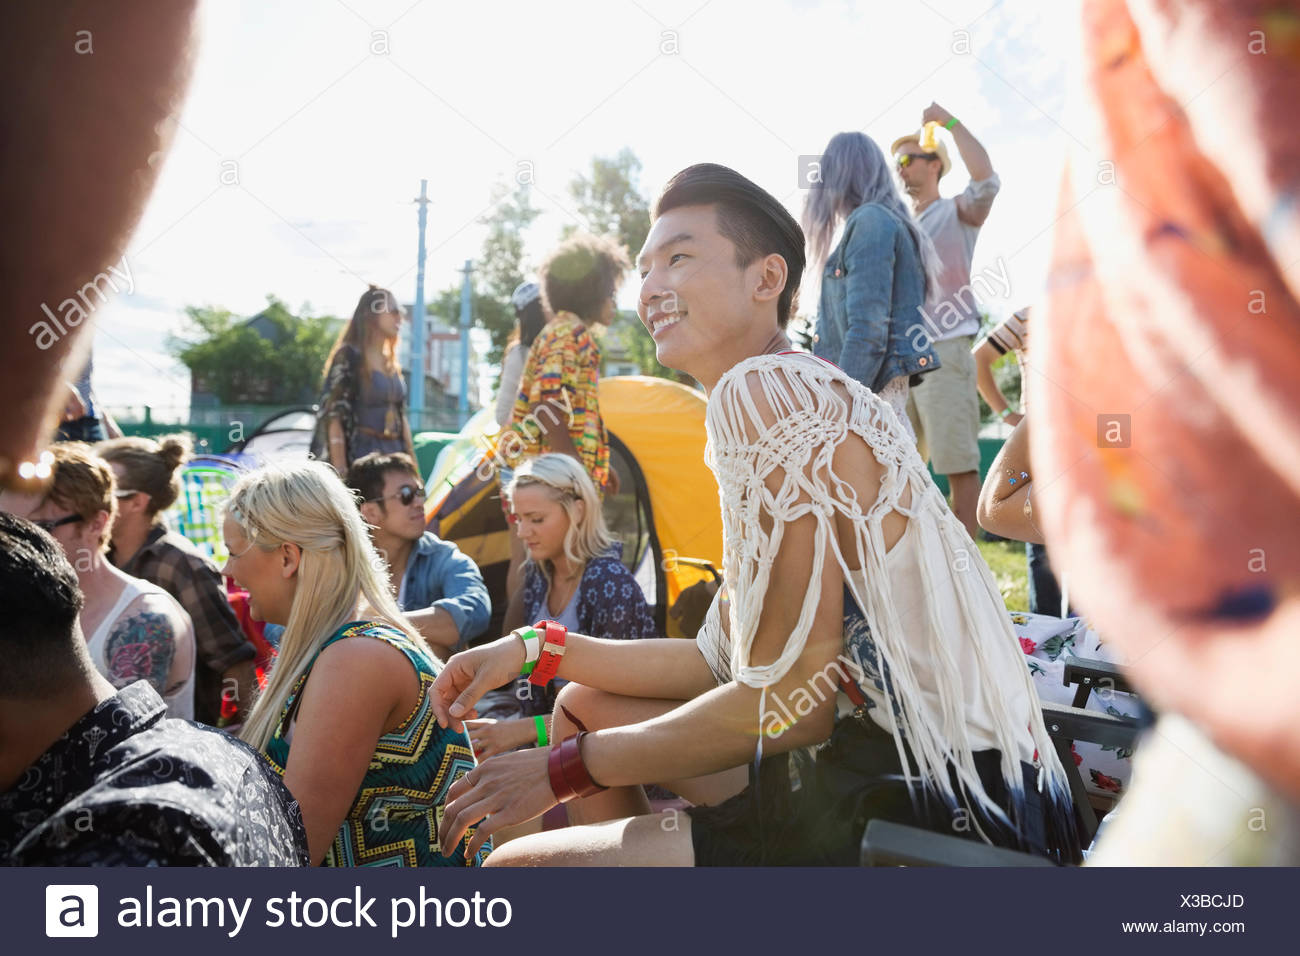 Smiling young man enjoying summer music festival - Stock Image